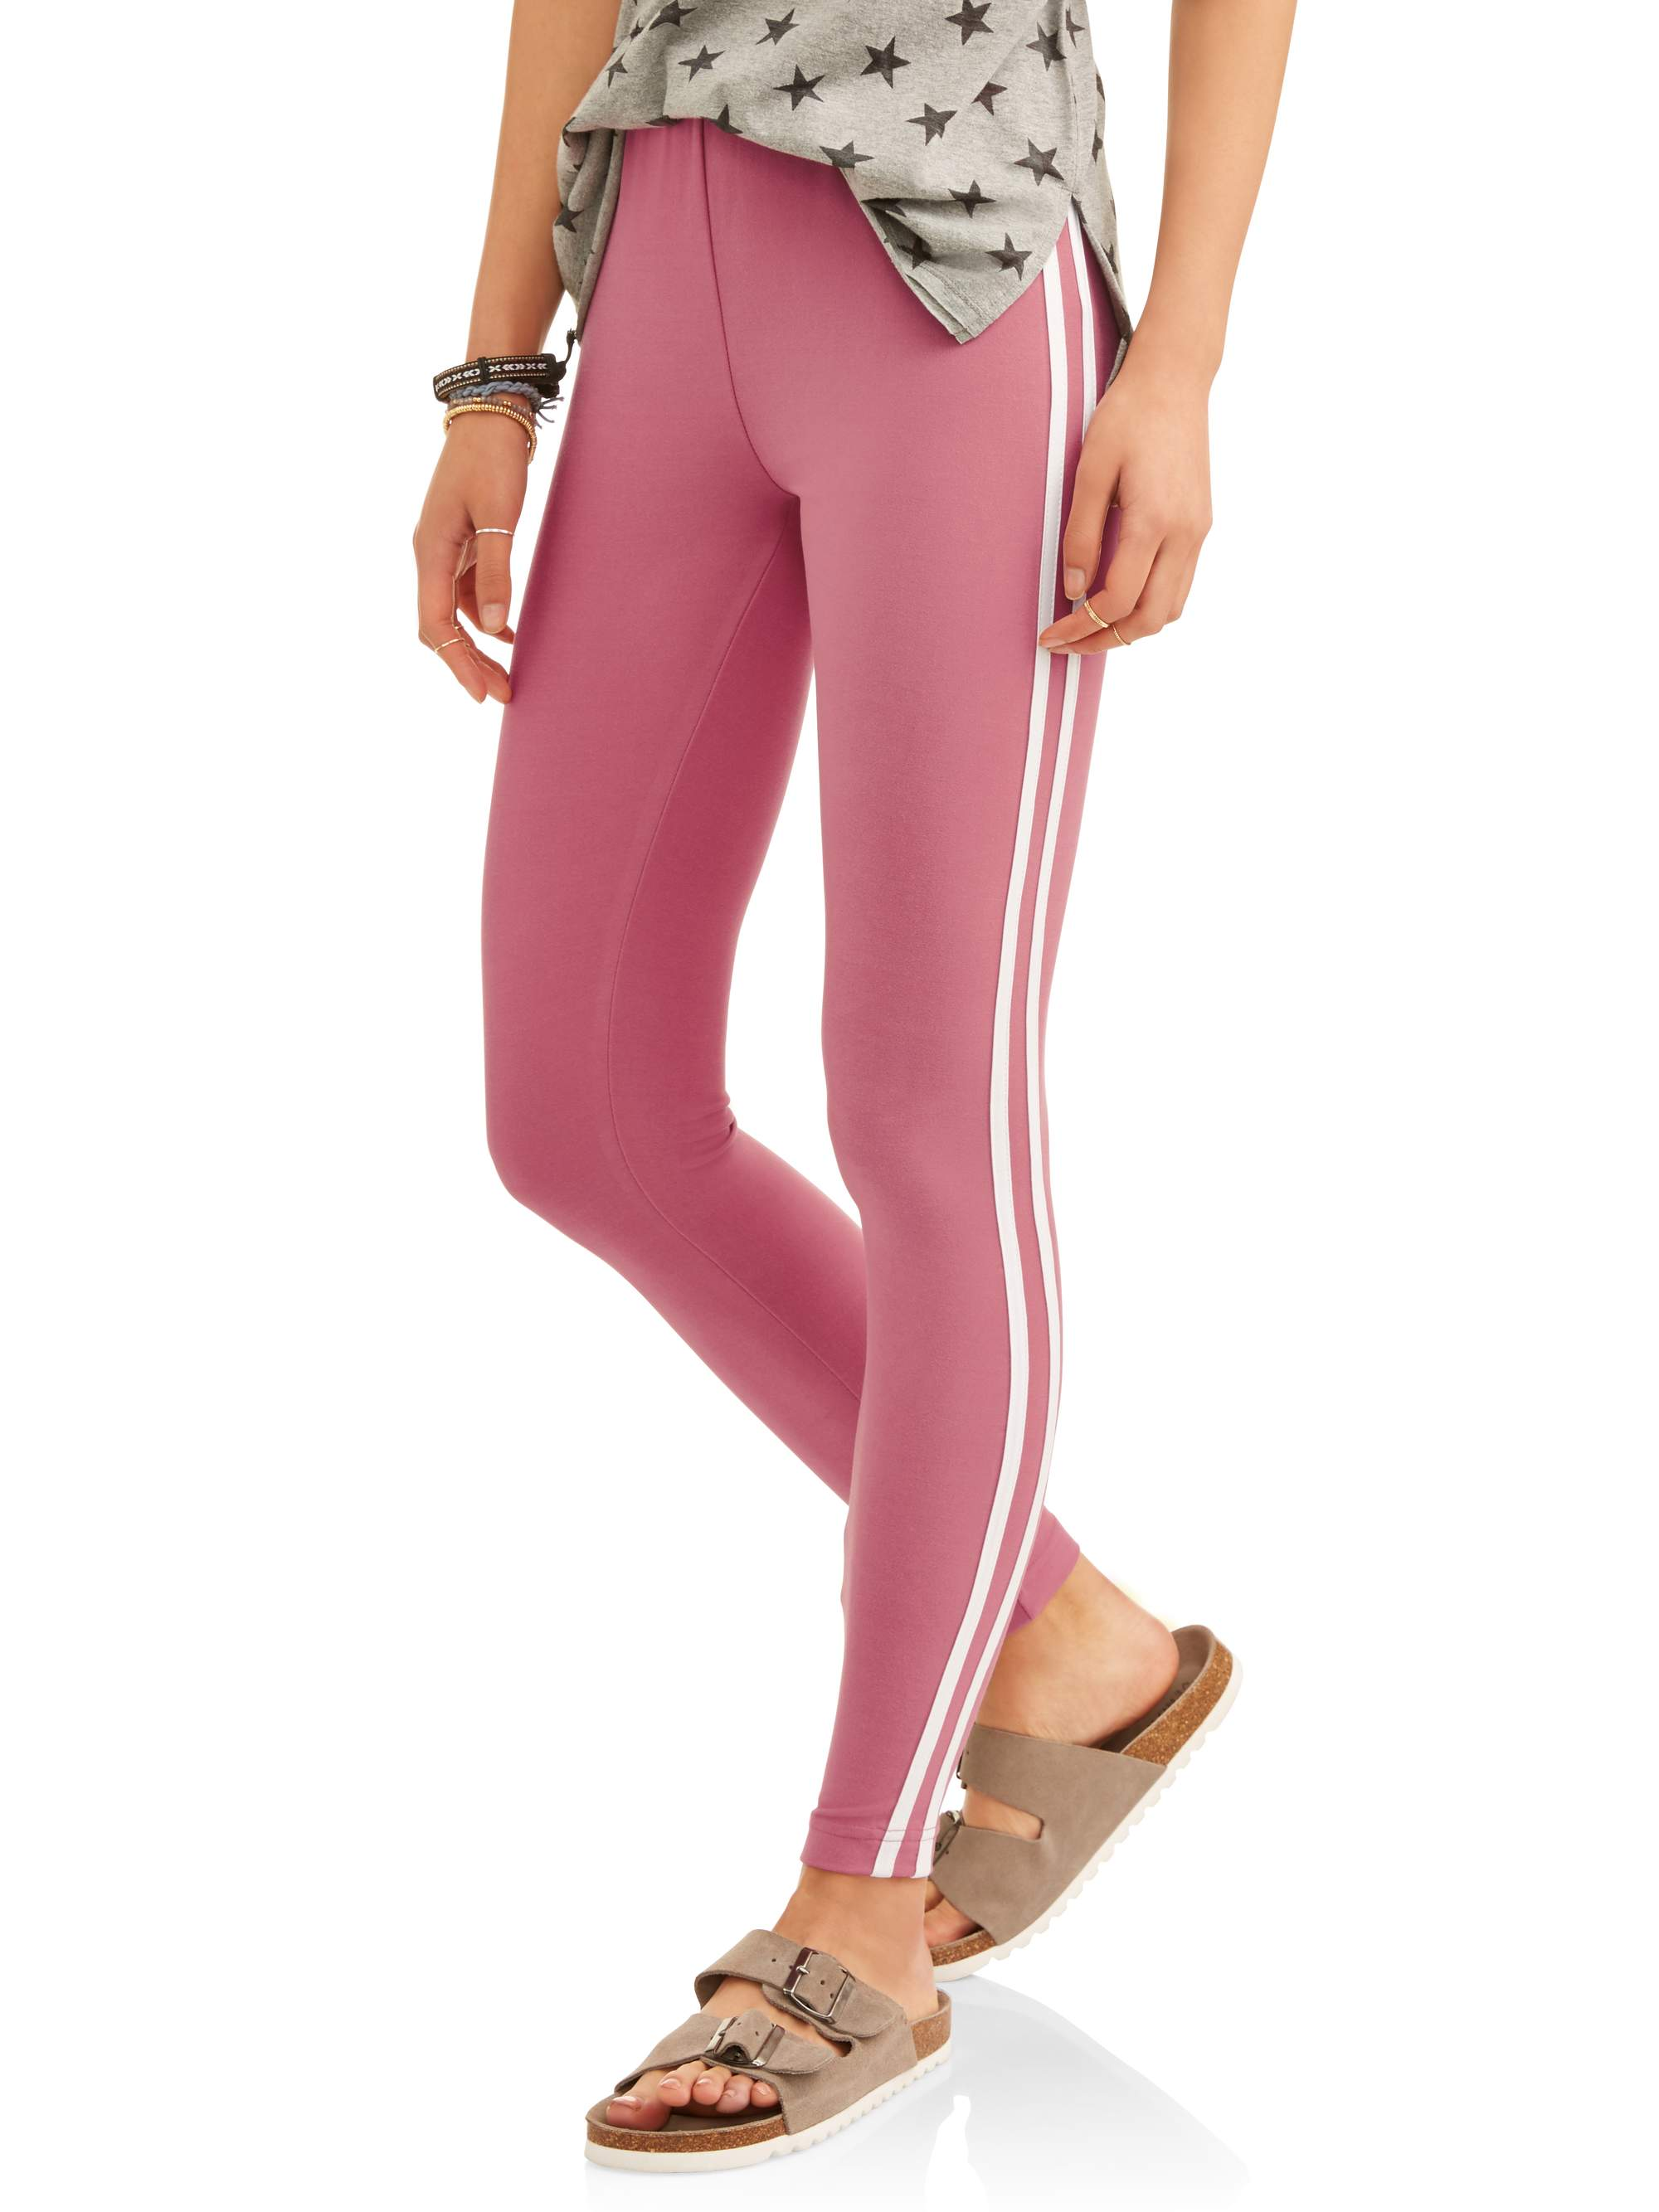 7-9 Pink No Boundaries Juniors Super Soft Side Stripe Ankle Leggings MEDIUM